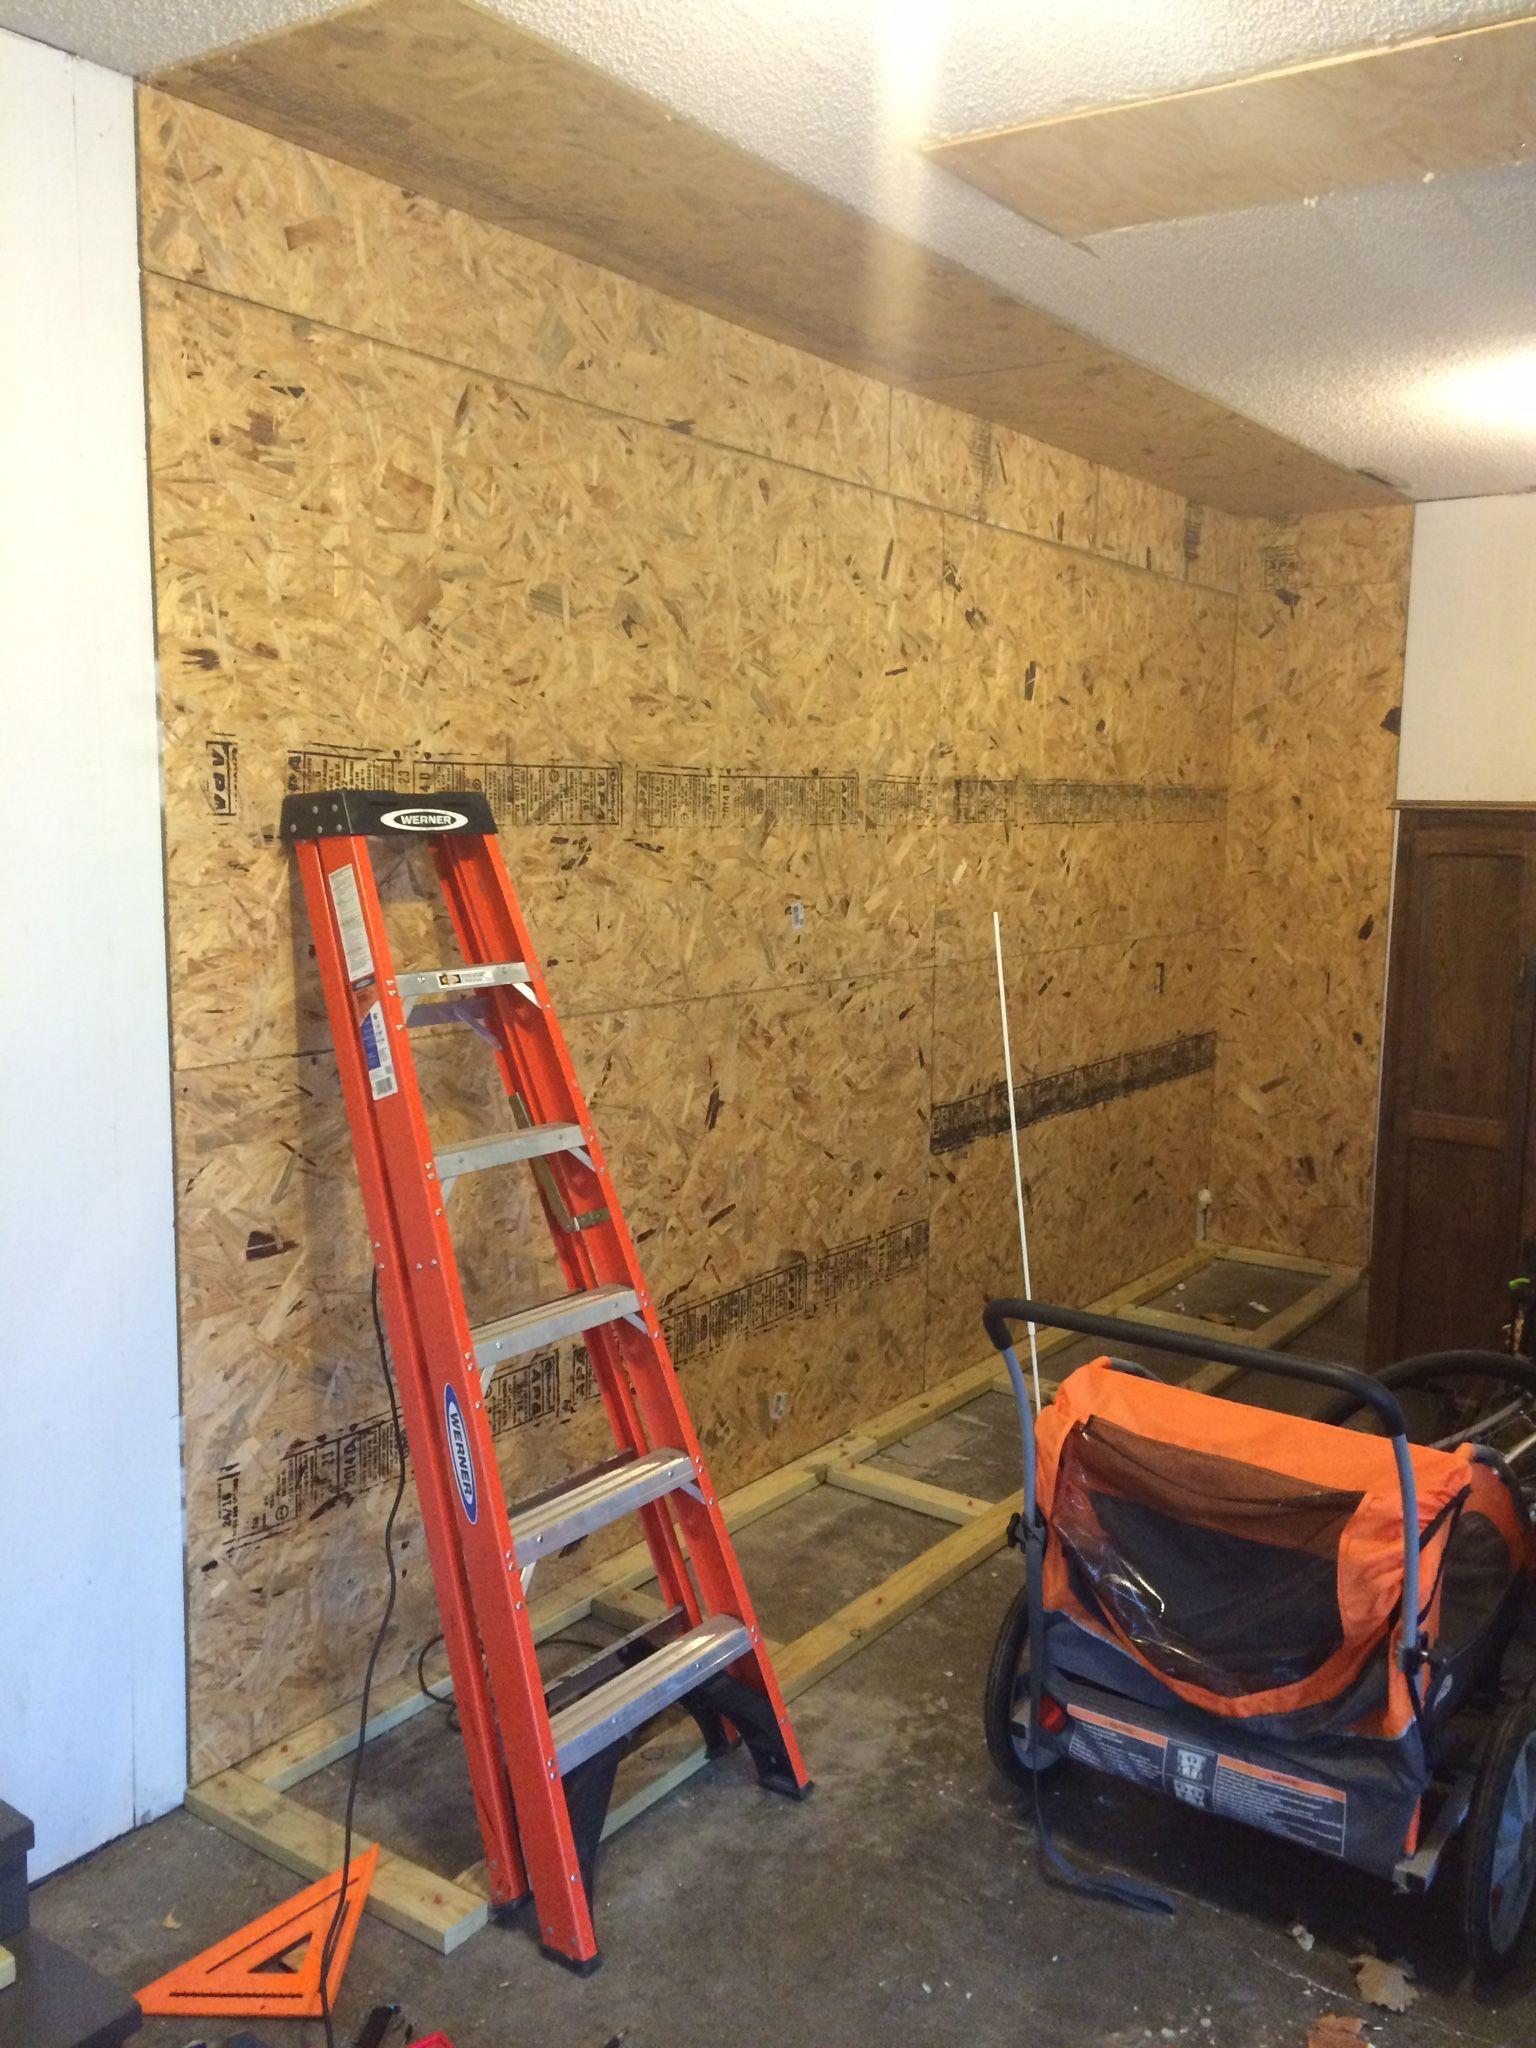 How to plan u build diy garage storage cabinets house pinterest